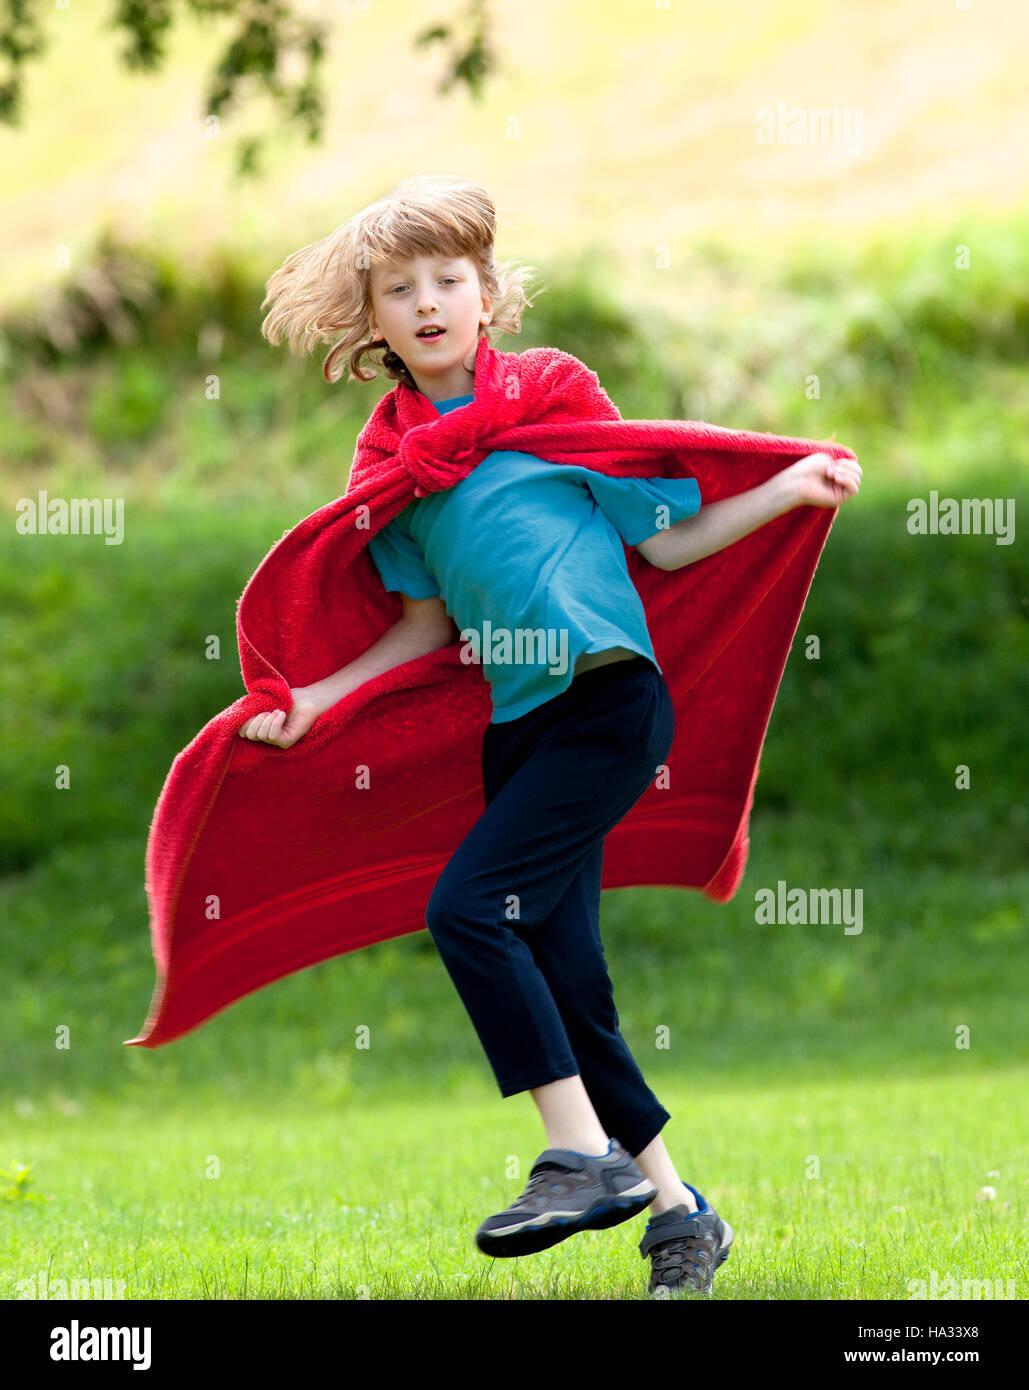 Boy Running Around in Red Towel as Superhero Cloak - Stock Image